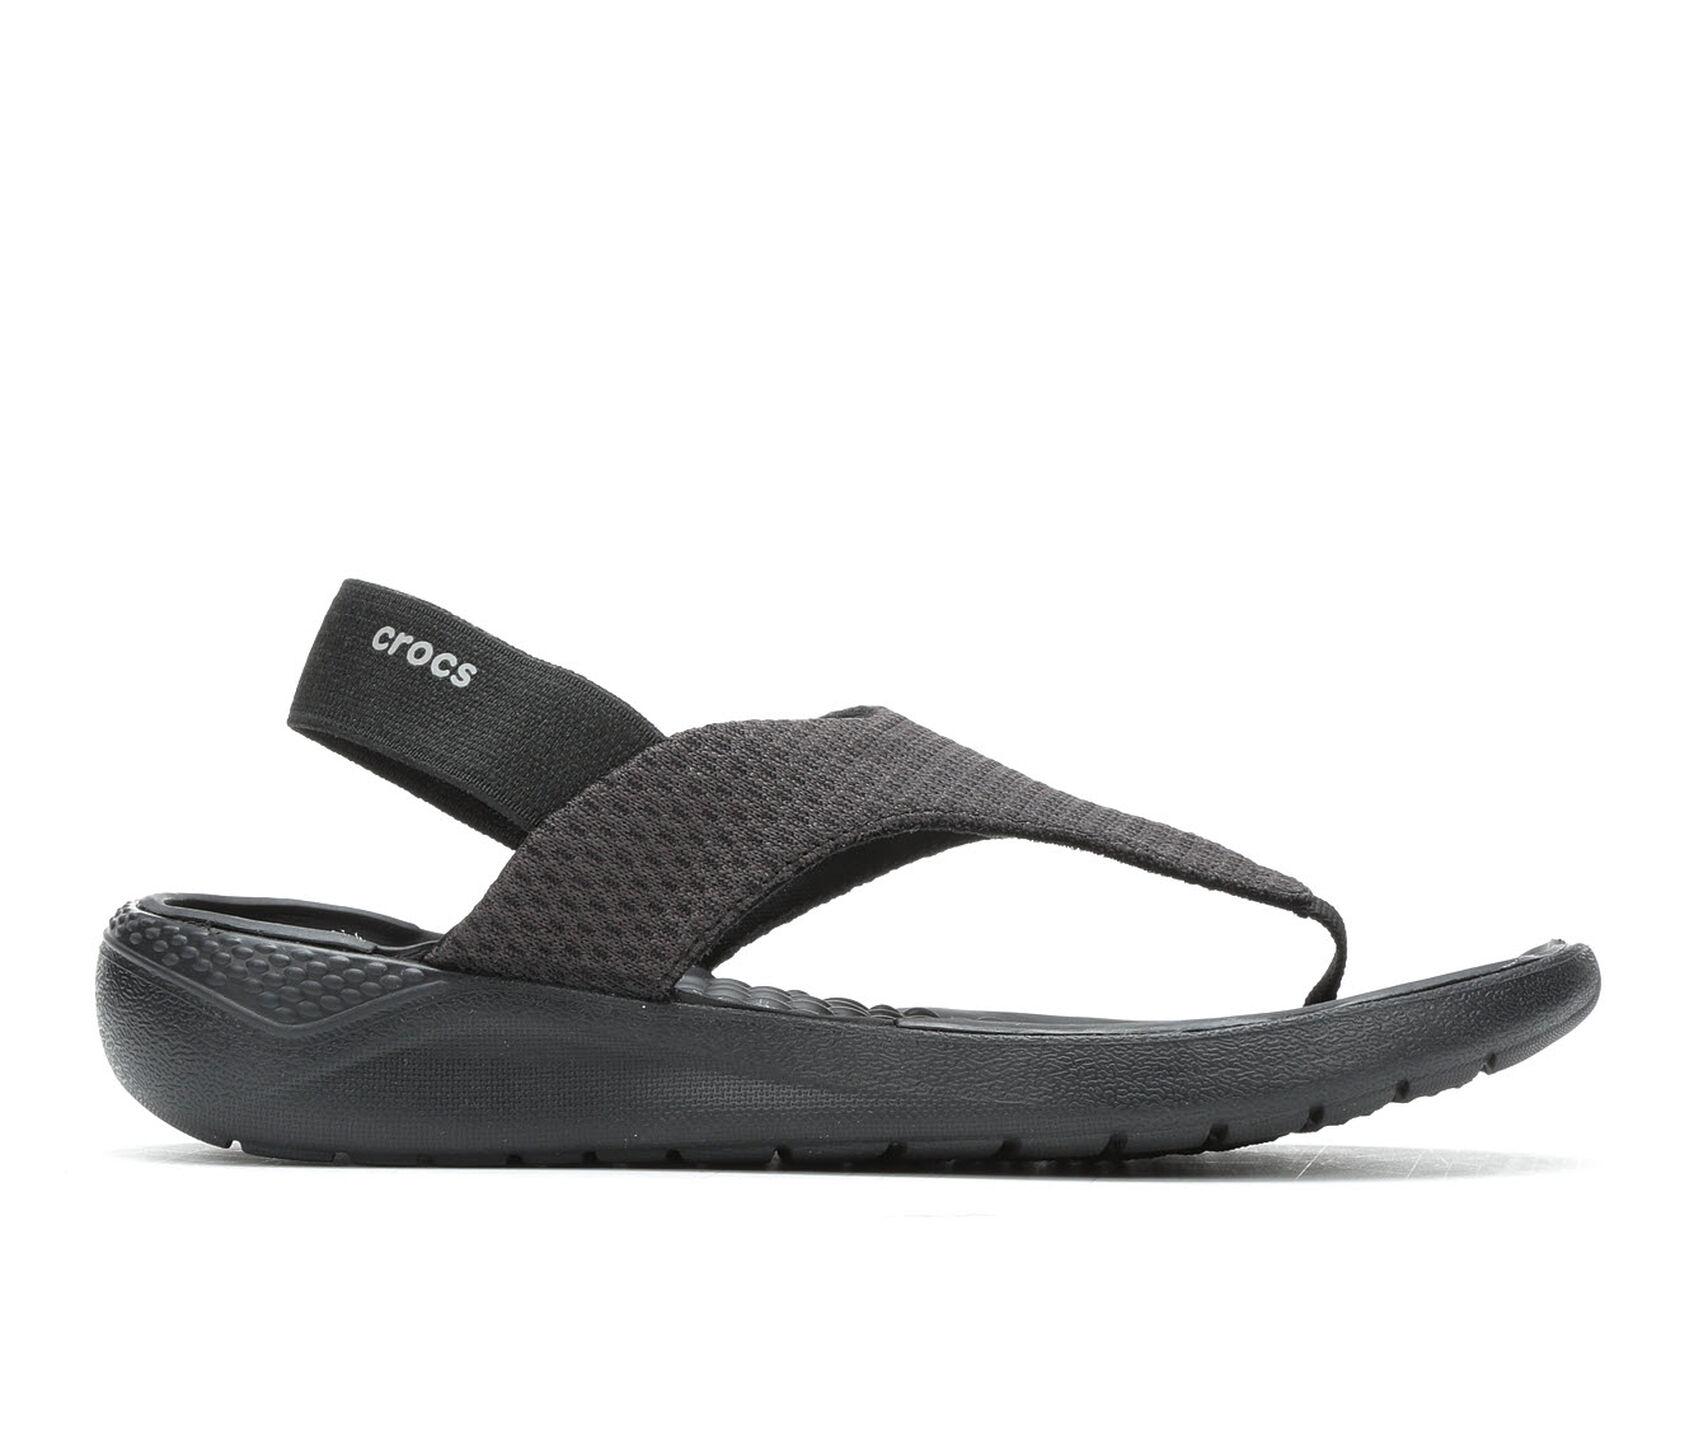 ce64bc848b6e4 Women's Crocs Literide Mesh Flip